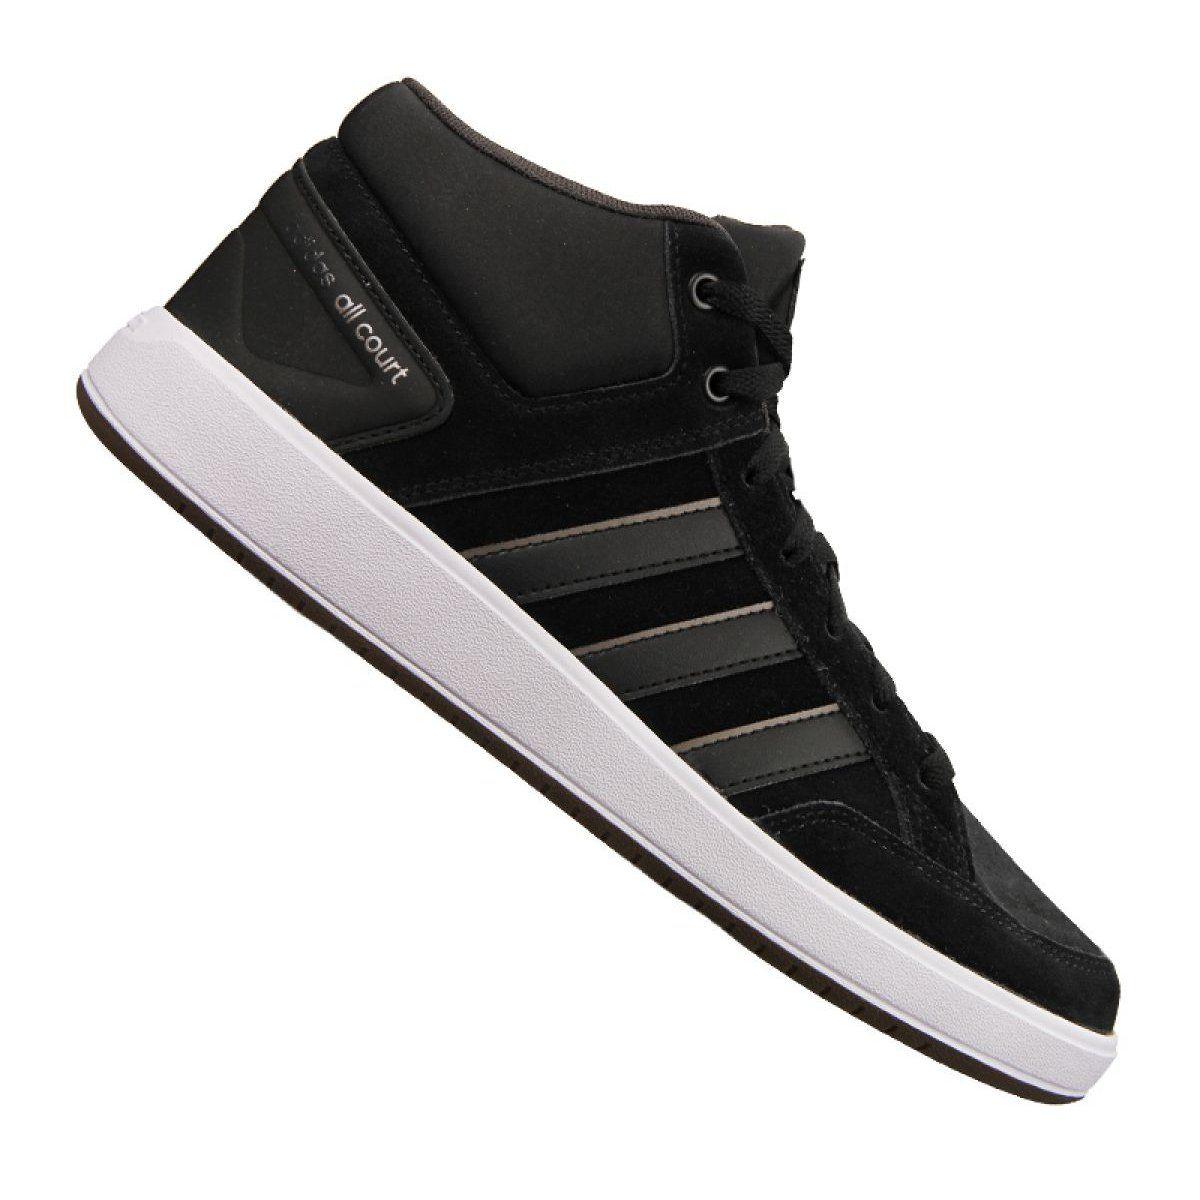 Buty Adidas Cloudfoam All Court Mid M B43858 Czarne Adidas Cloudfoam Sports Shoes Adidas Adidas